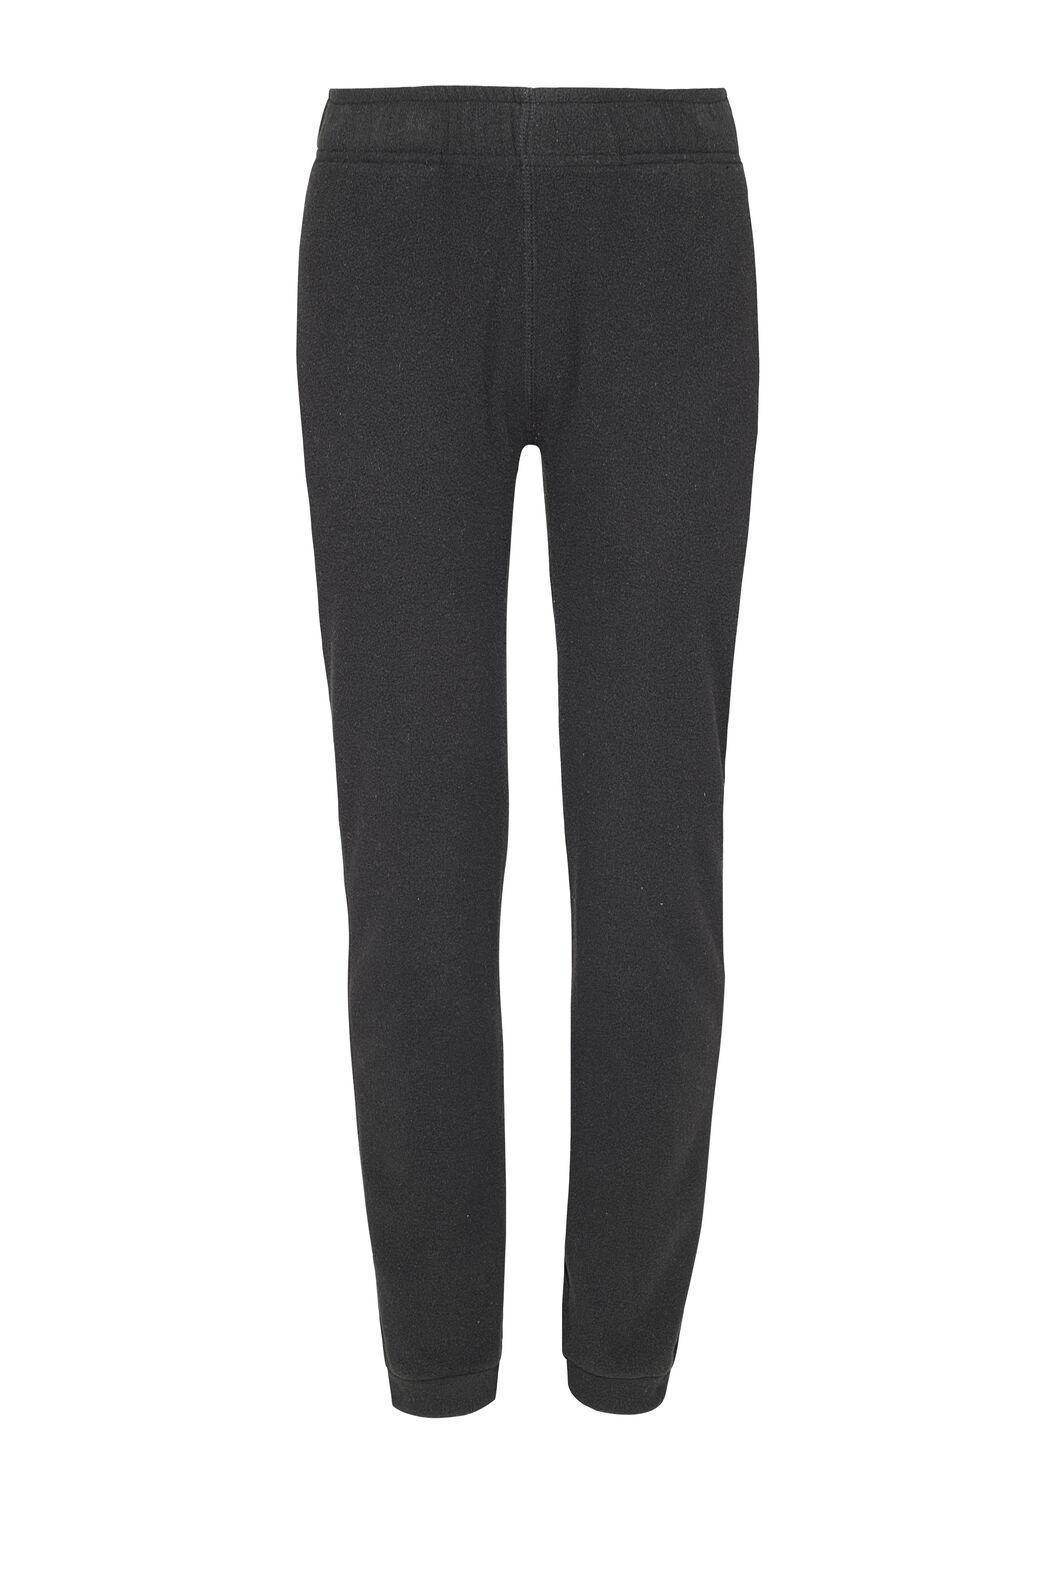 Macpac Tui Polartec® Fleece Pants — Kids', Black, hi-res